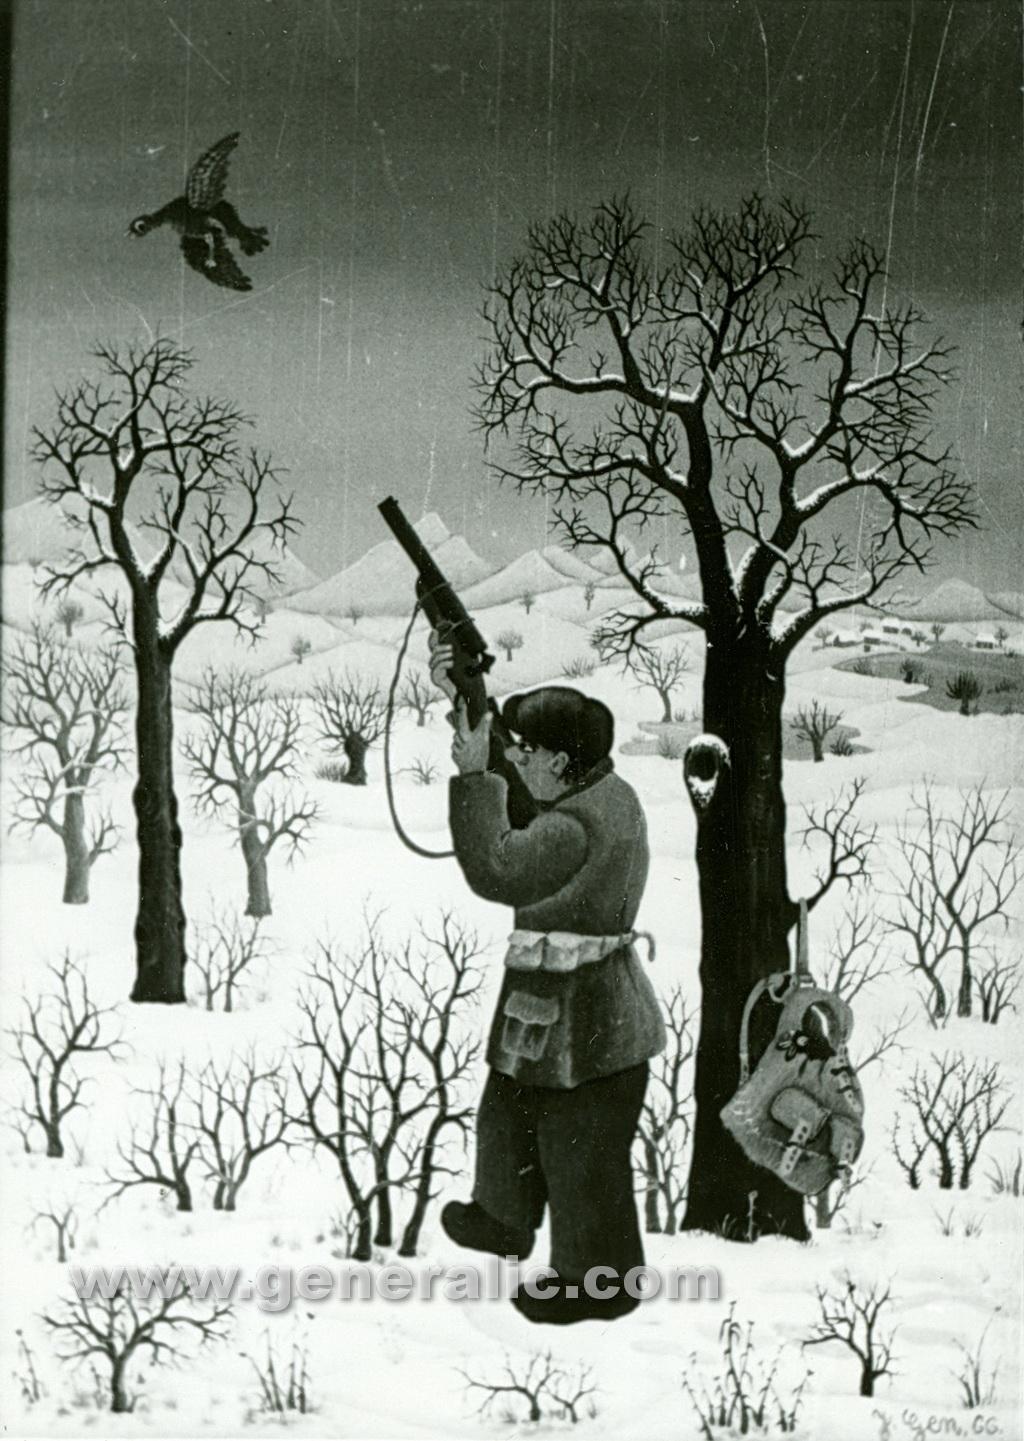 Josip Generalic, 1966, Hunter, oil on glass